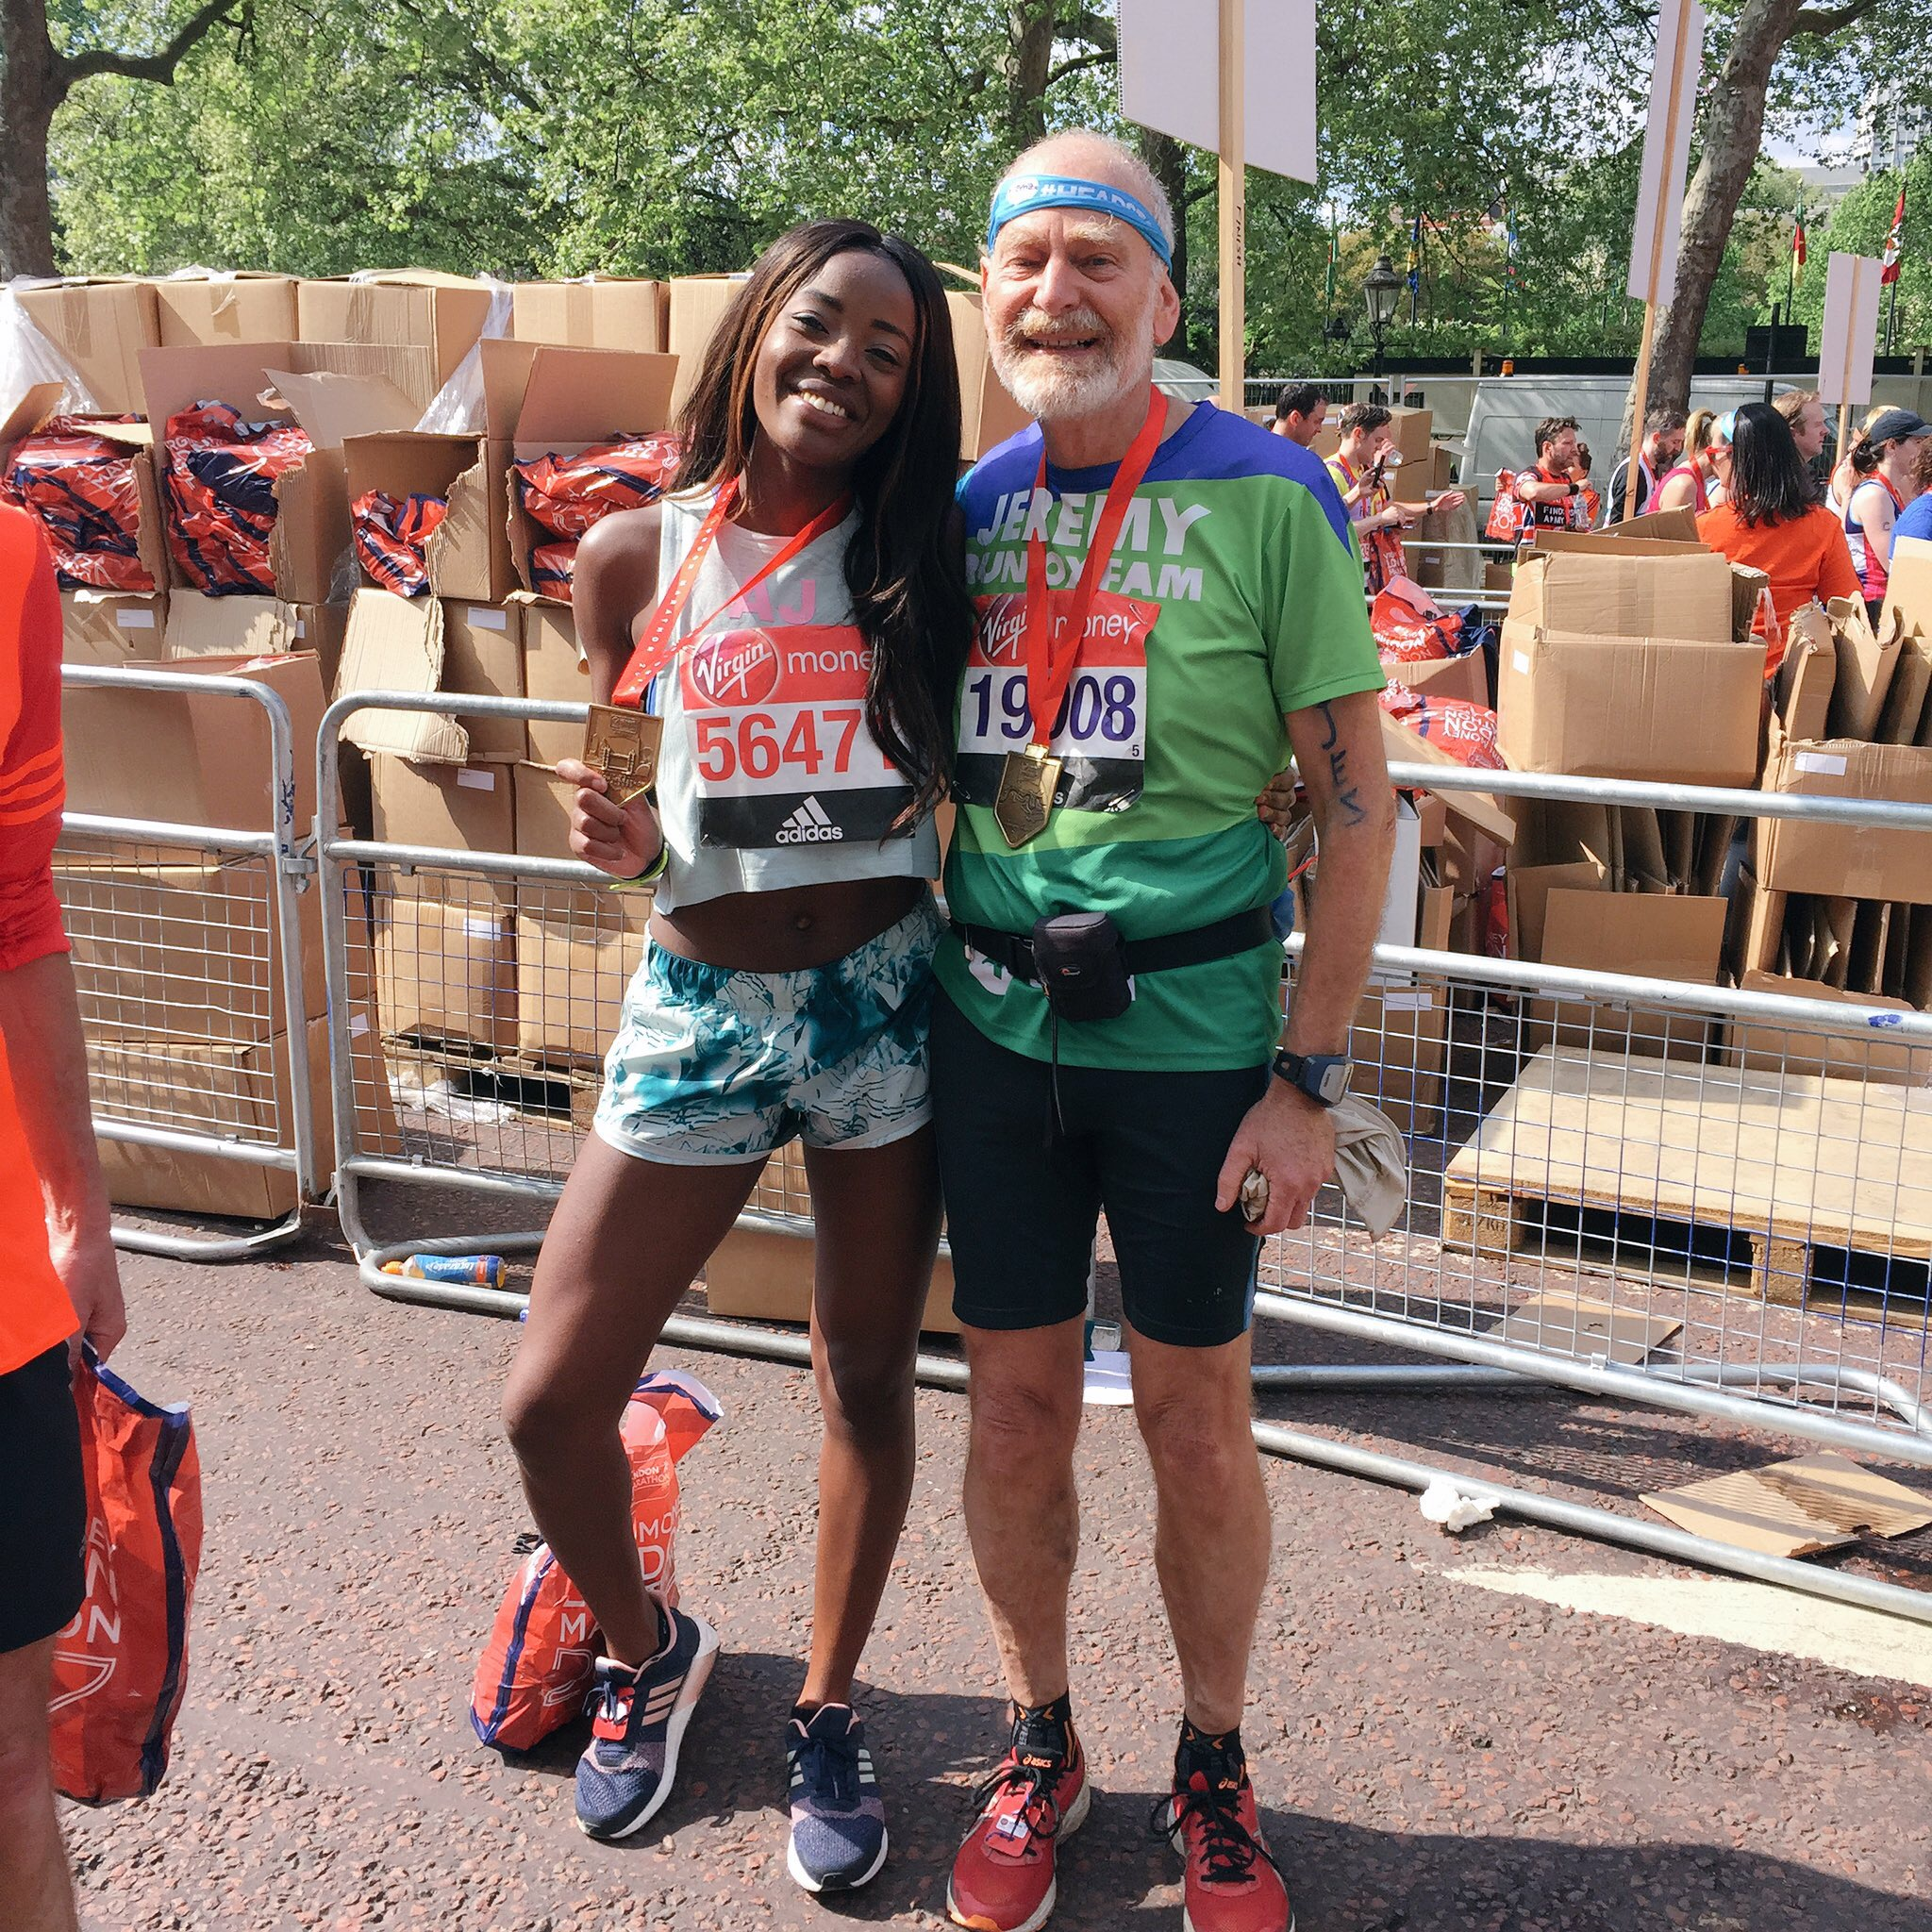 Virgin Money London Marathon 2017